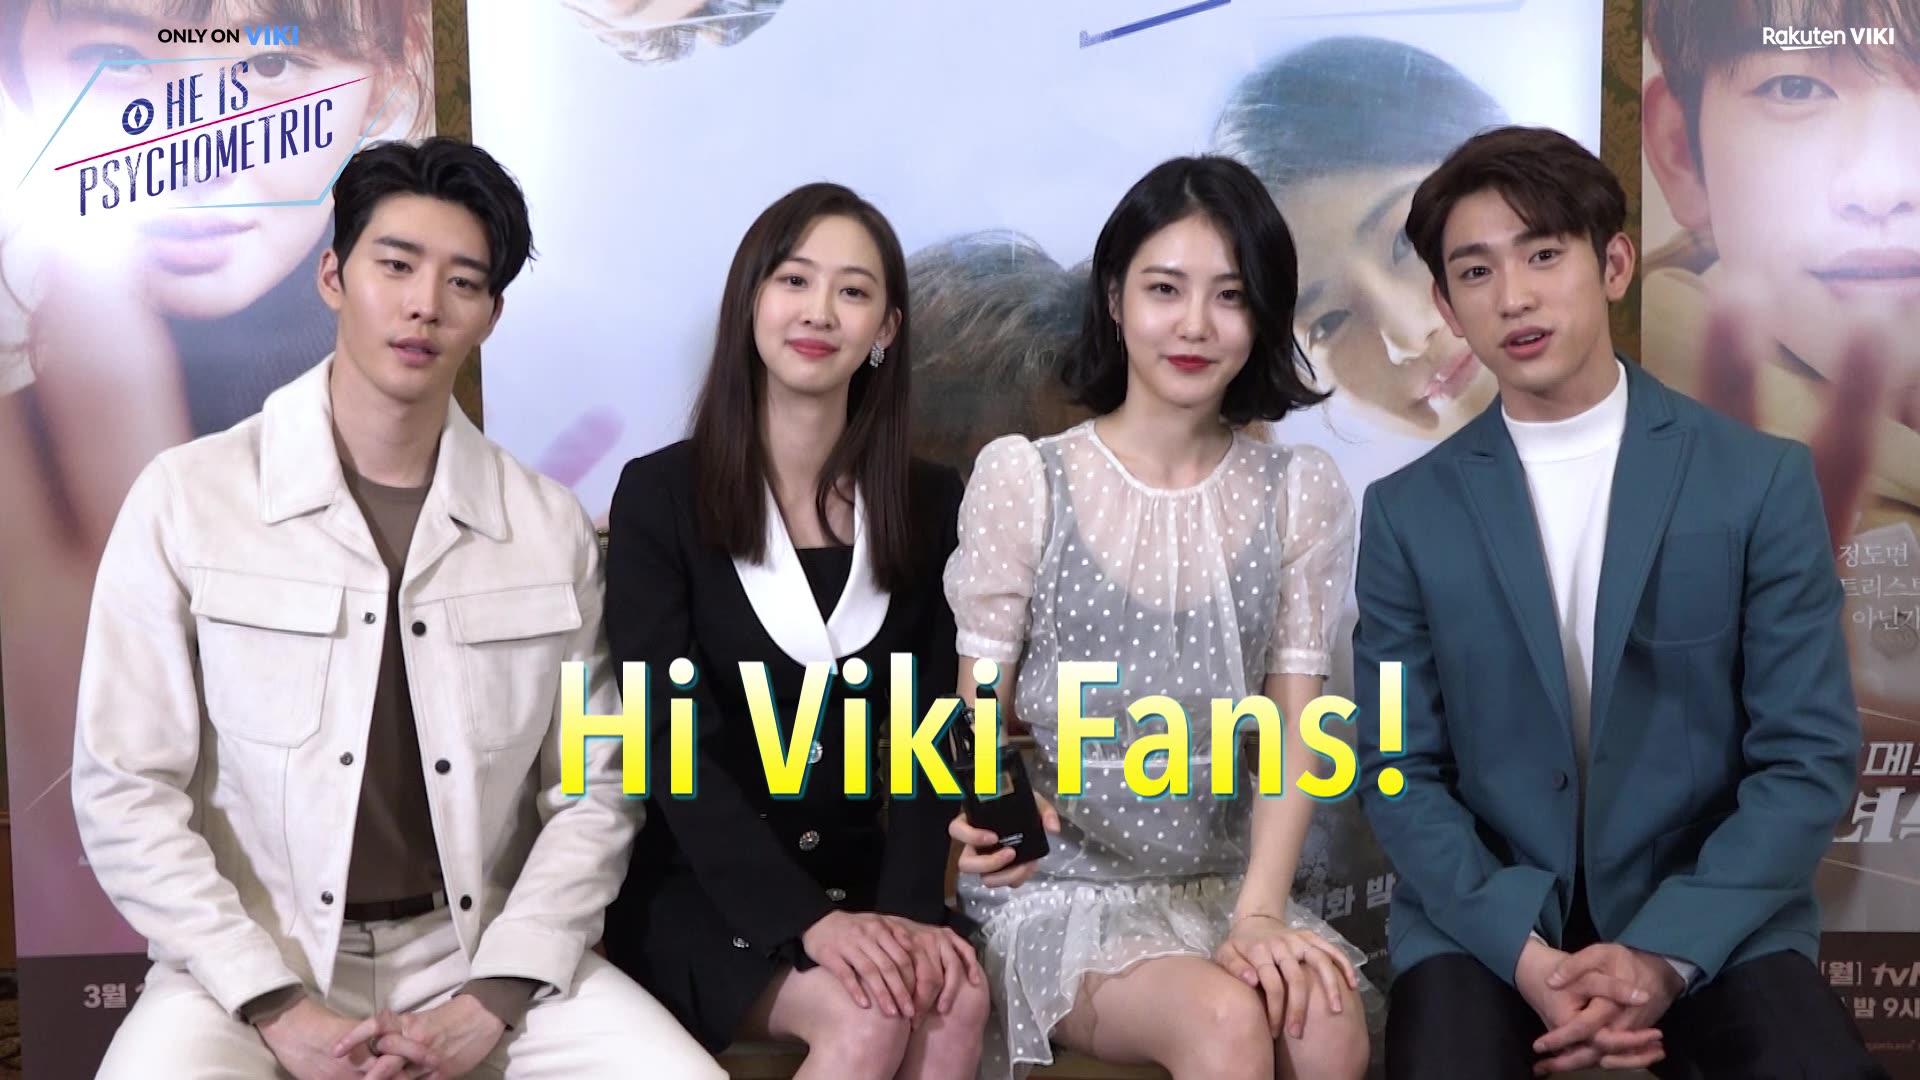 Shoutout to Viki Fans: He Is Psychometric